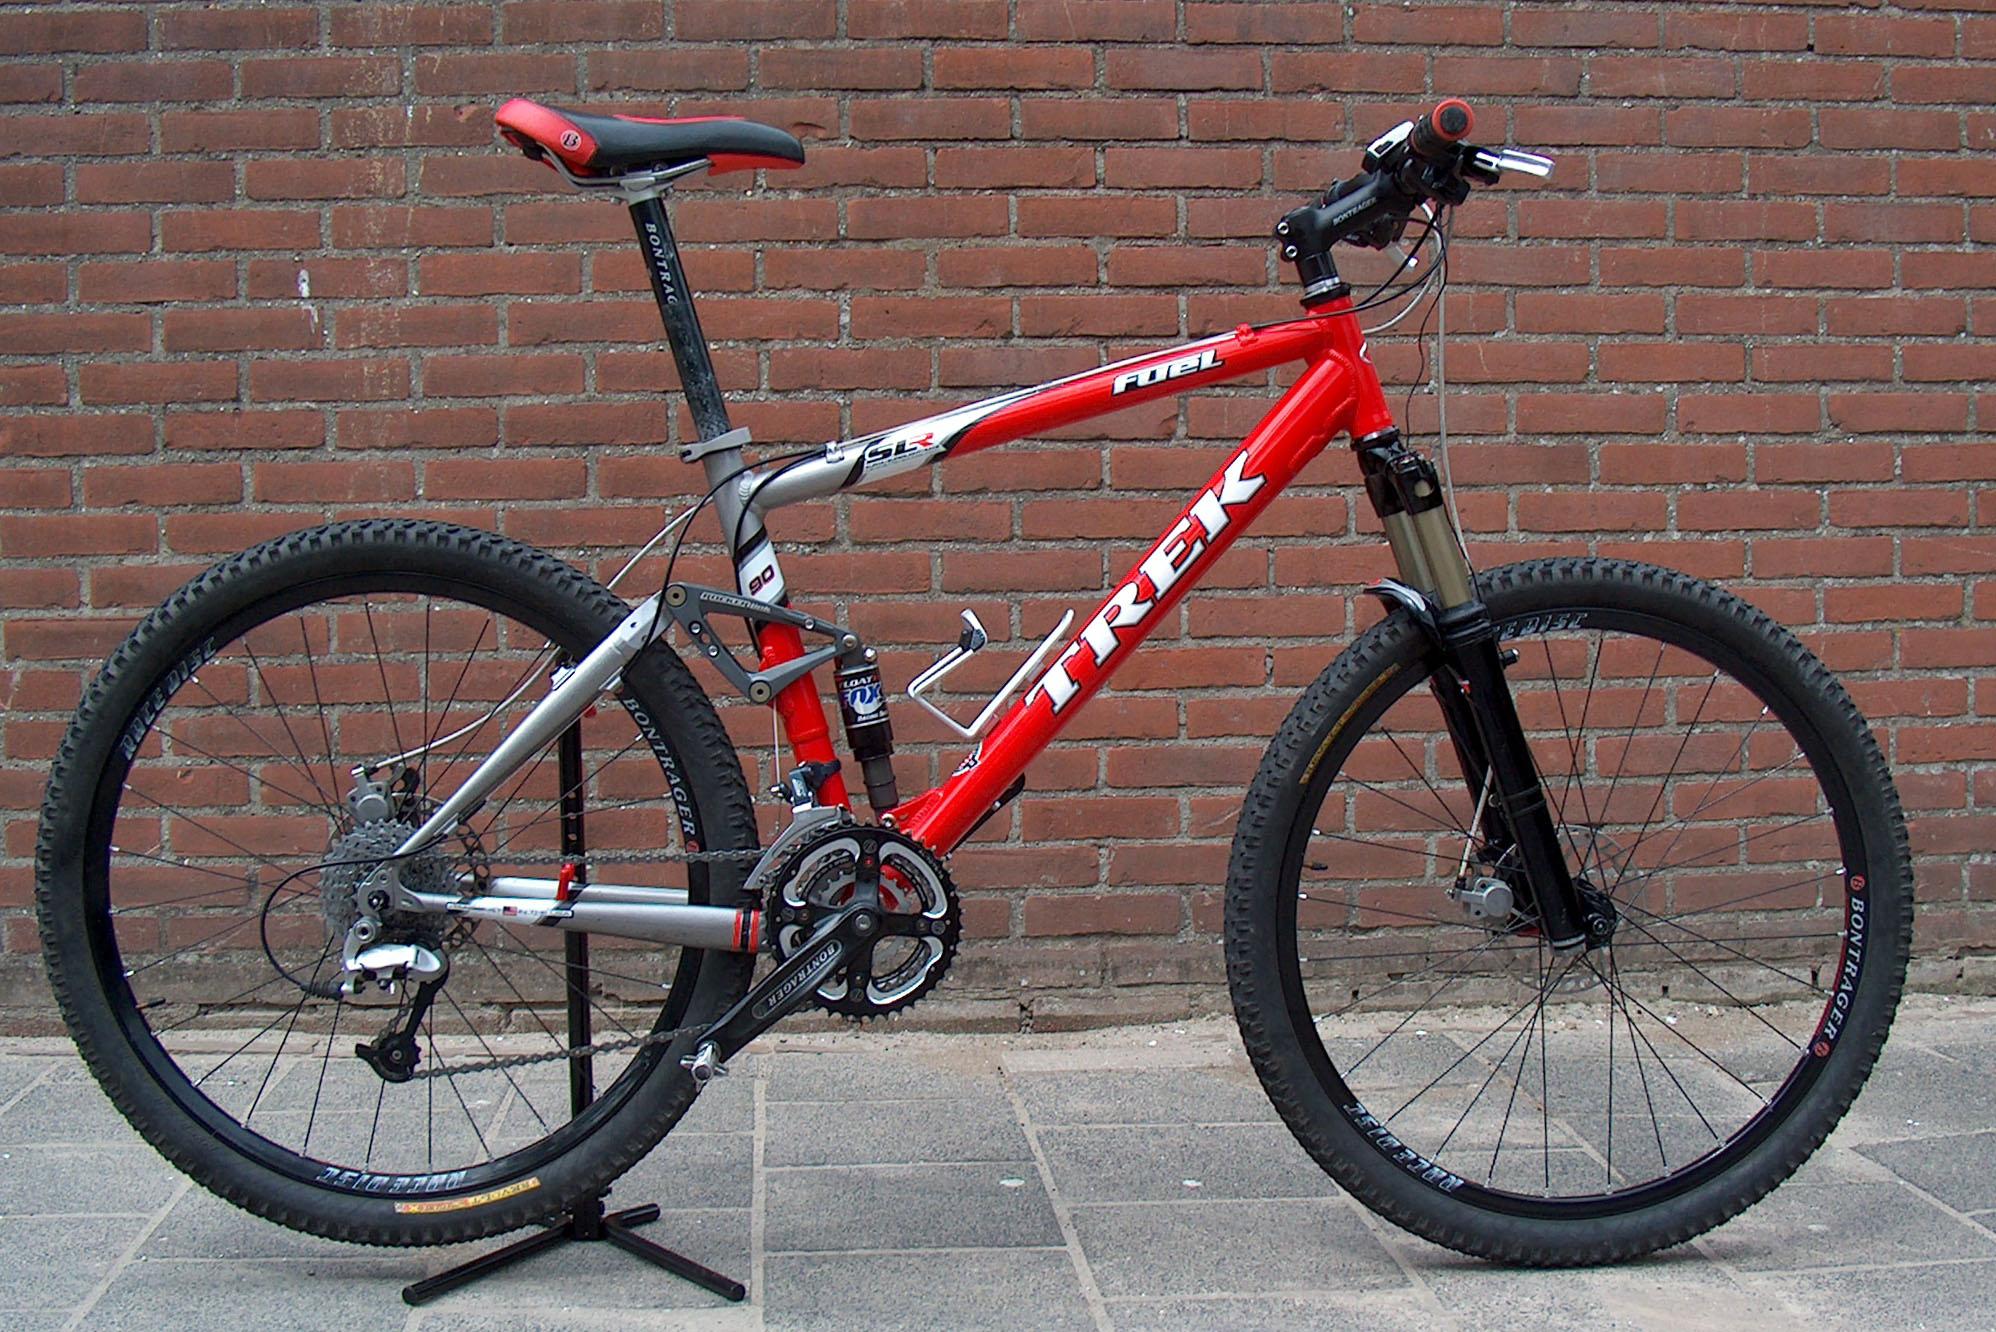 Red Bmx Bike Rims